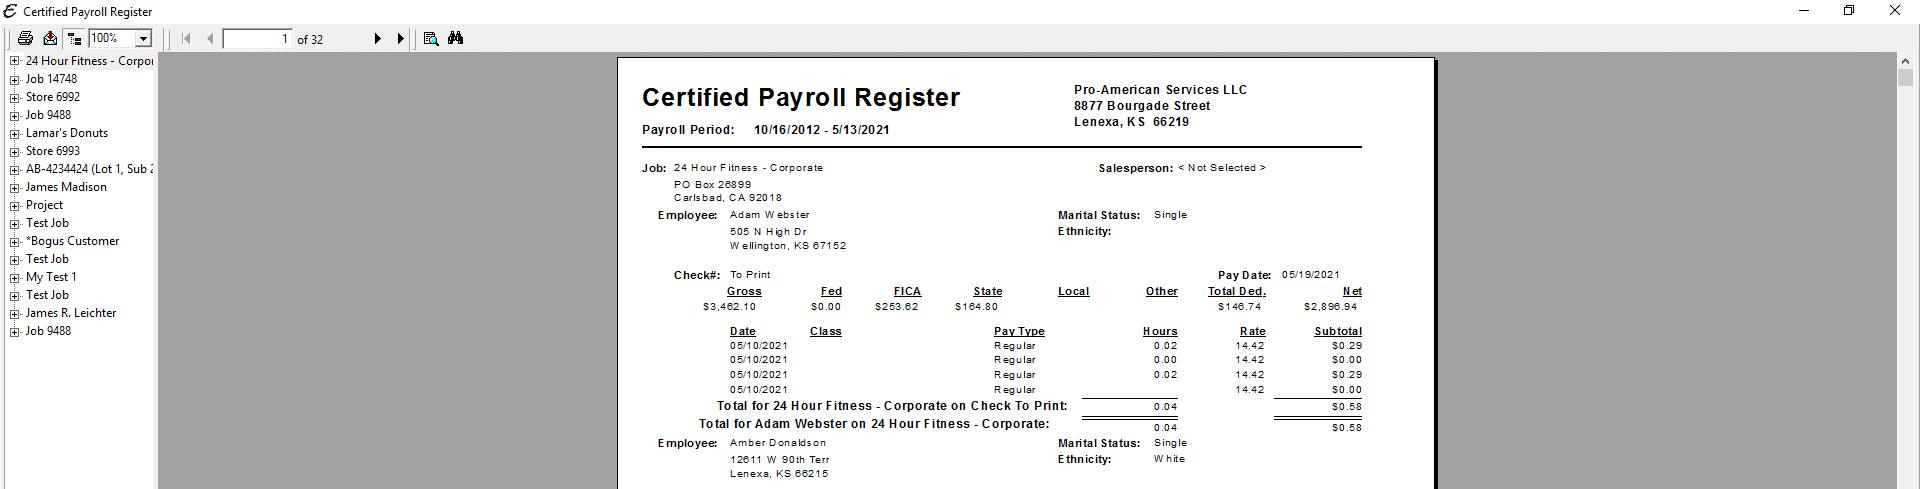 Certified Payroll Register PDF